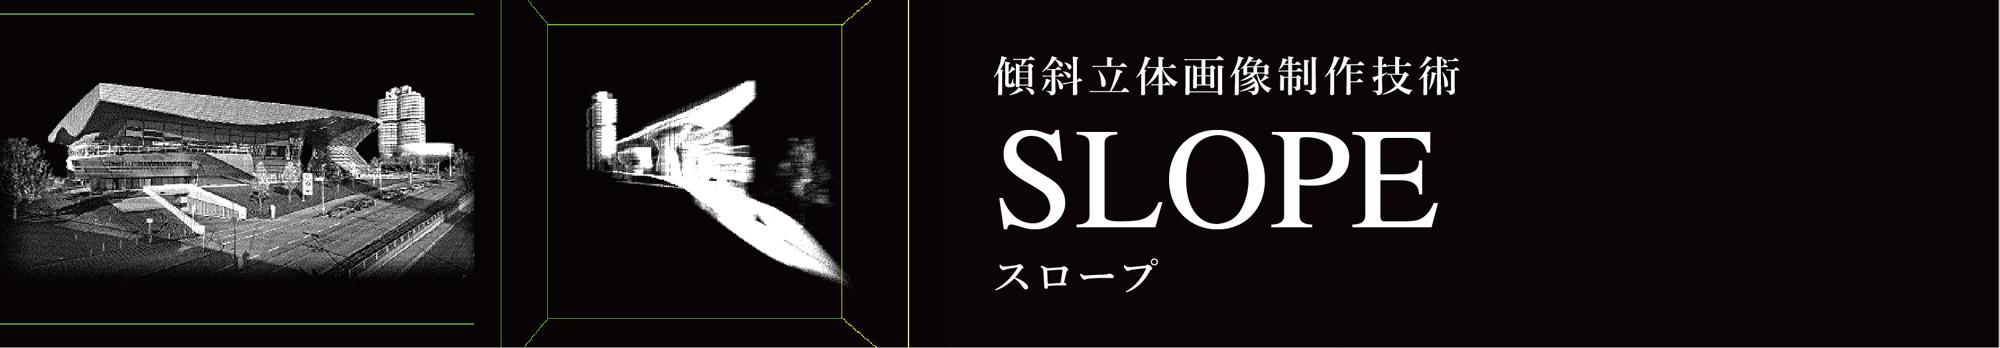 SLOPE(スロープ)